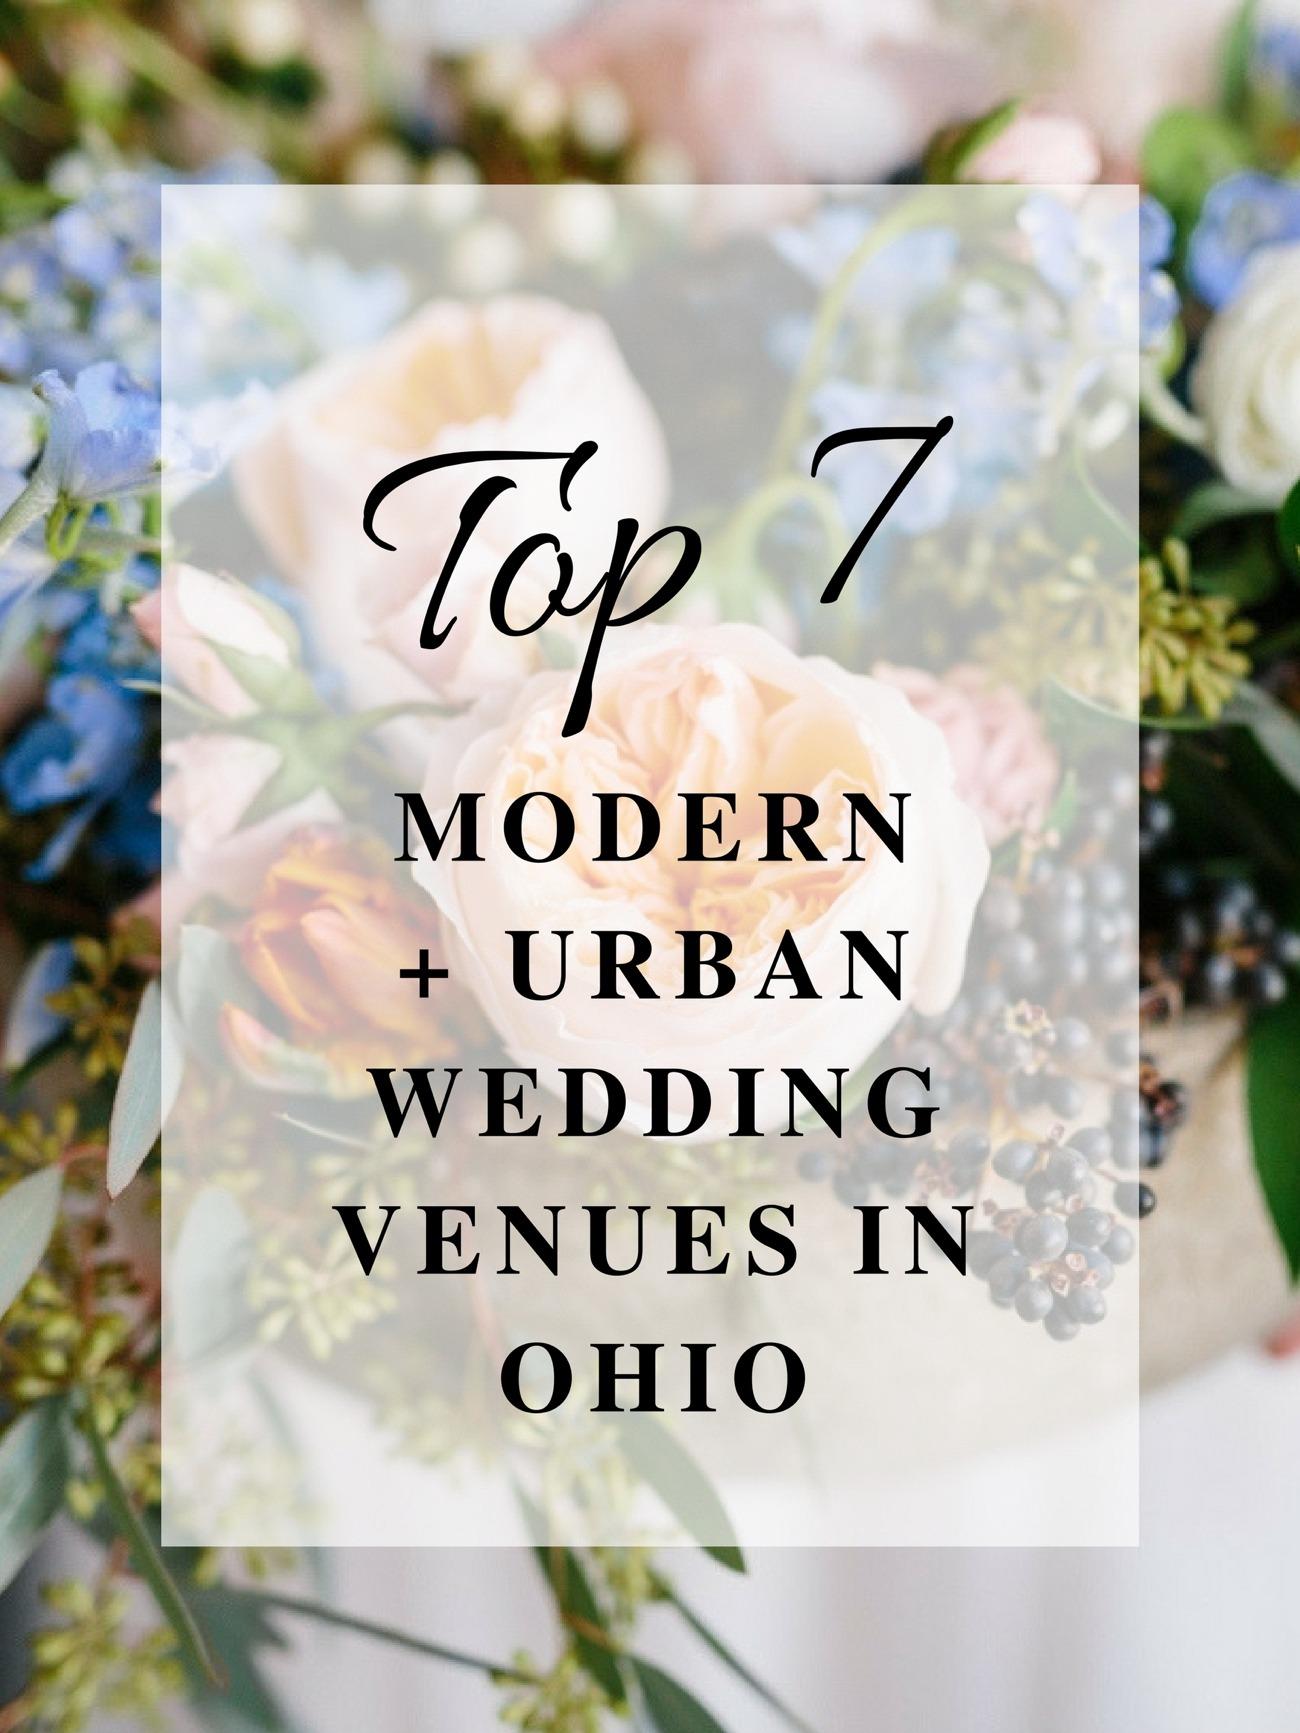 Top 7 Modern + Urban Wedding Venues in Ohio | Wedding Florist in Ohio